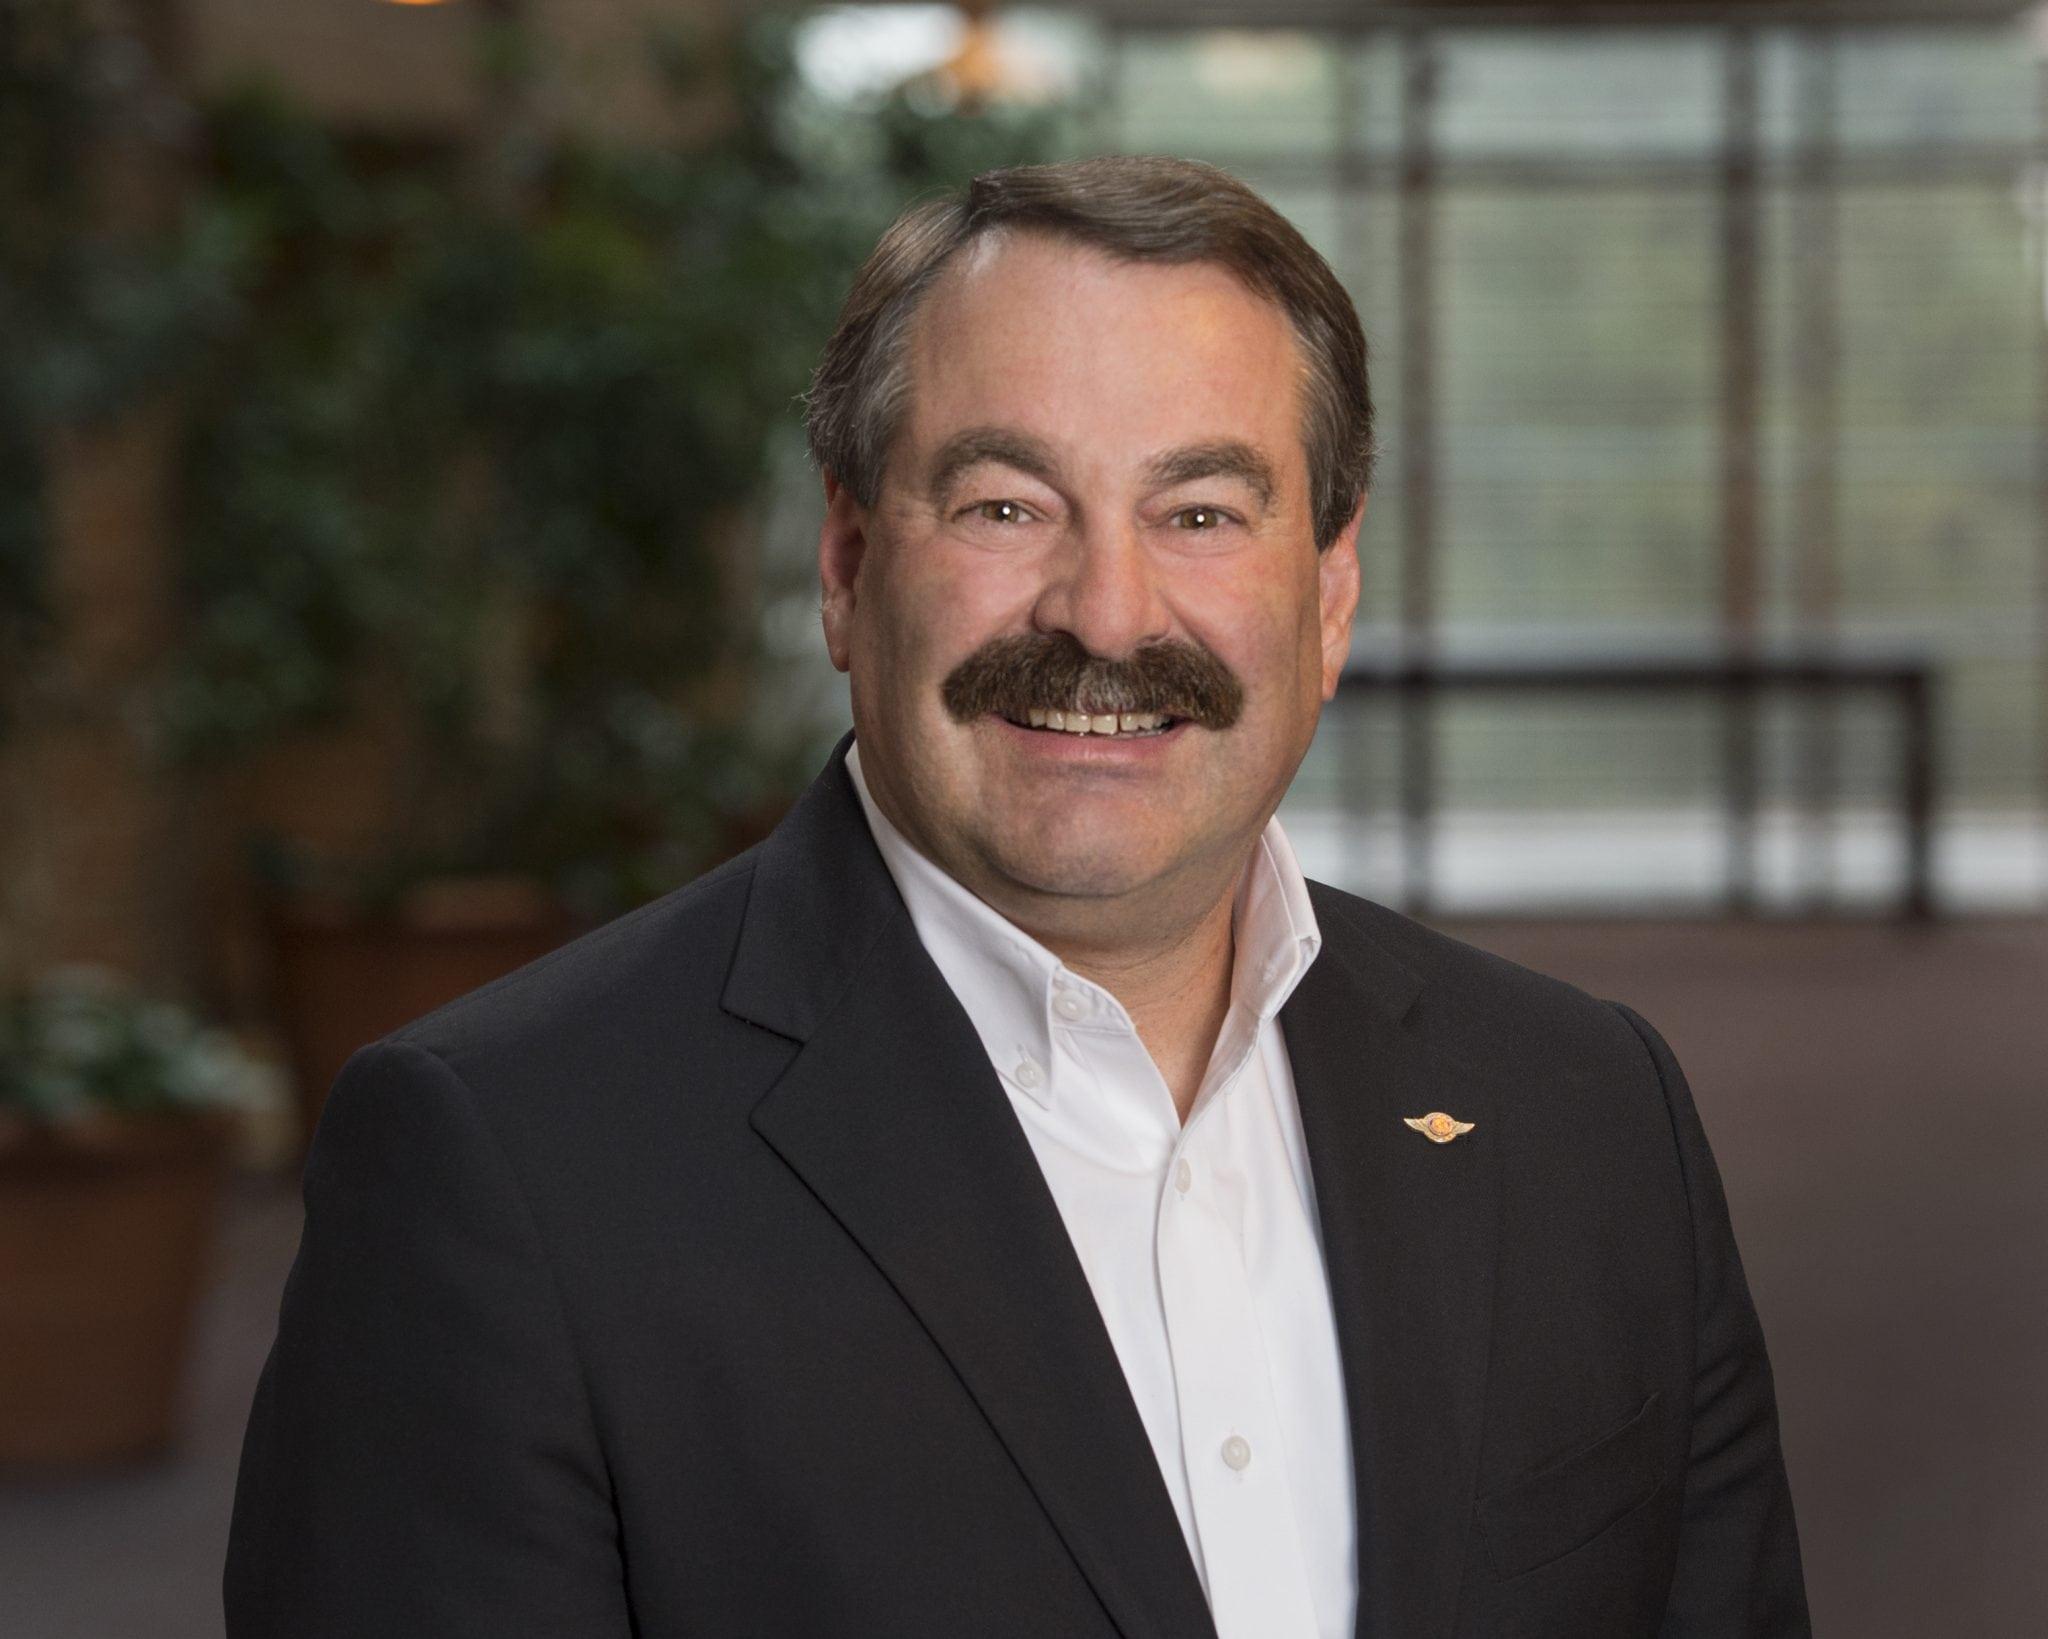 Mark Van Tine, current Boeing VP of digital aviation, set to step down in June 2016